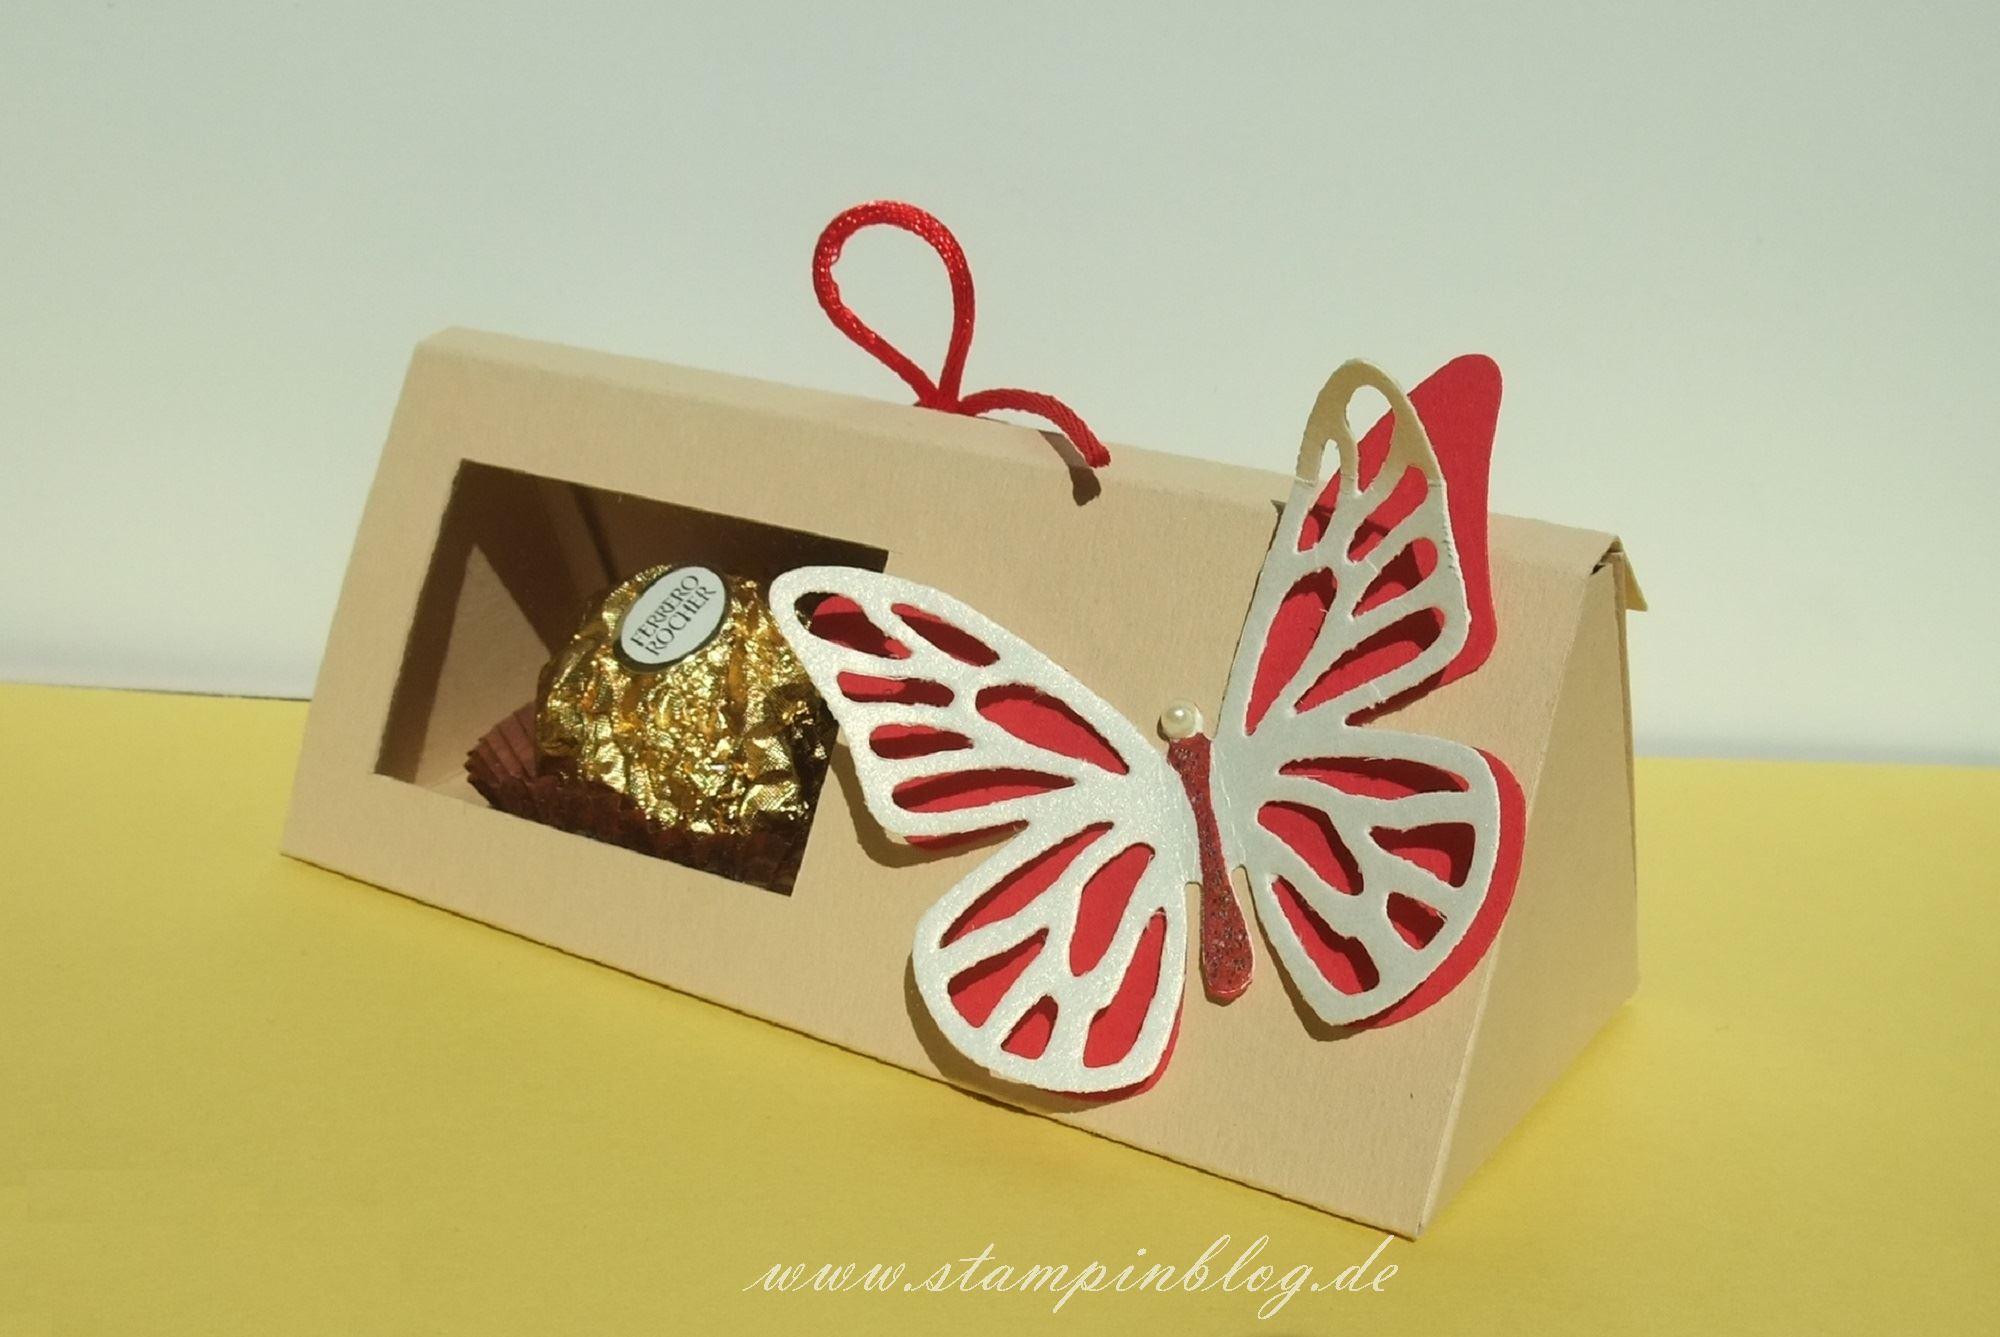 Verpackung-Dreieck-Rocher-beige-2